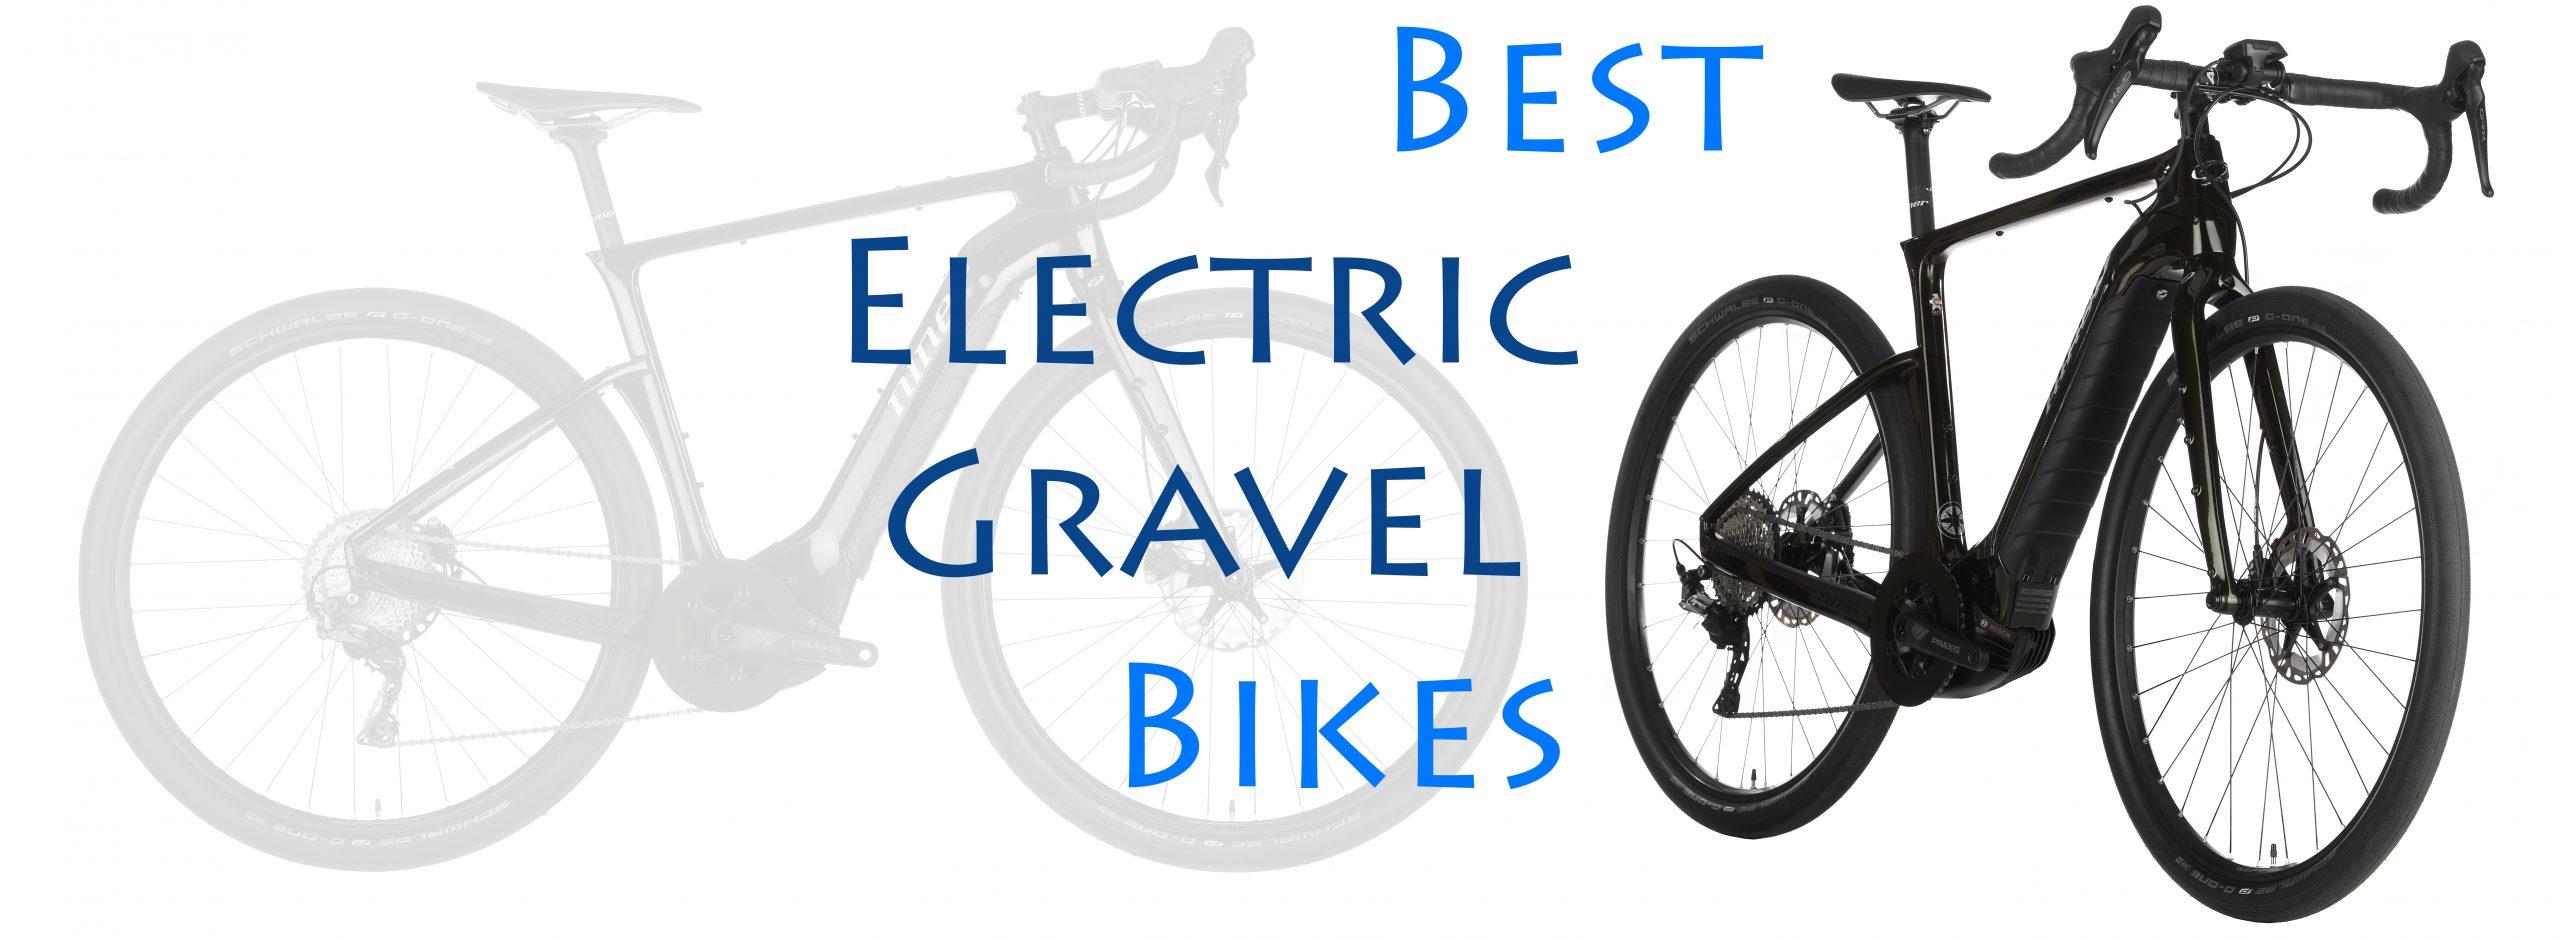 best electric gravel bikes